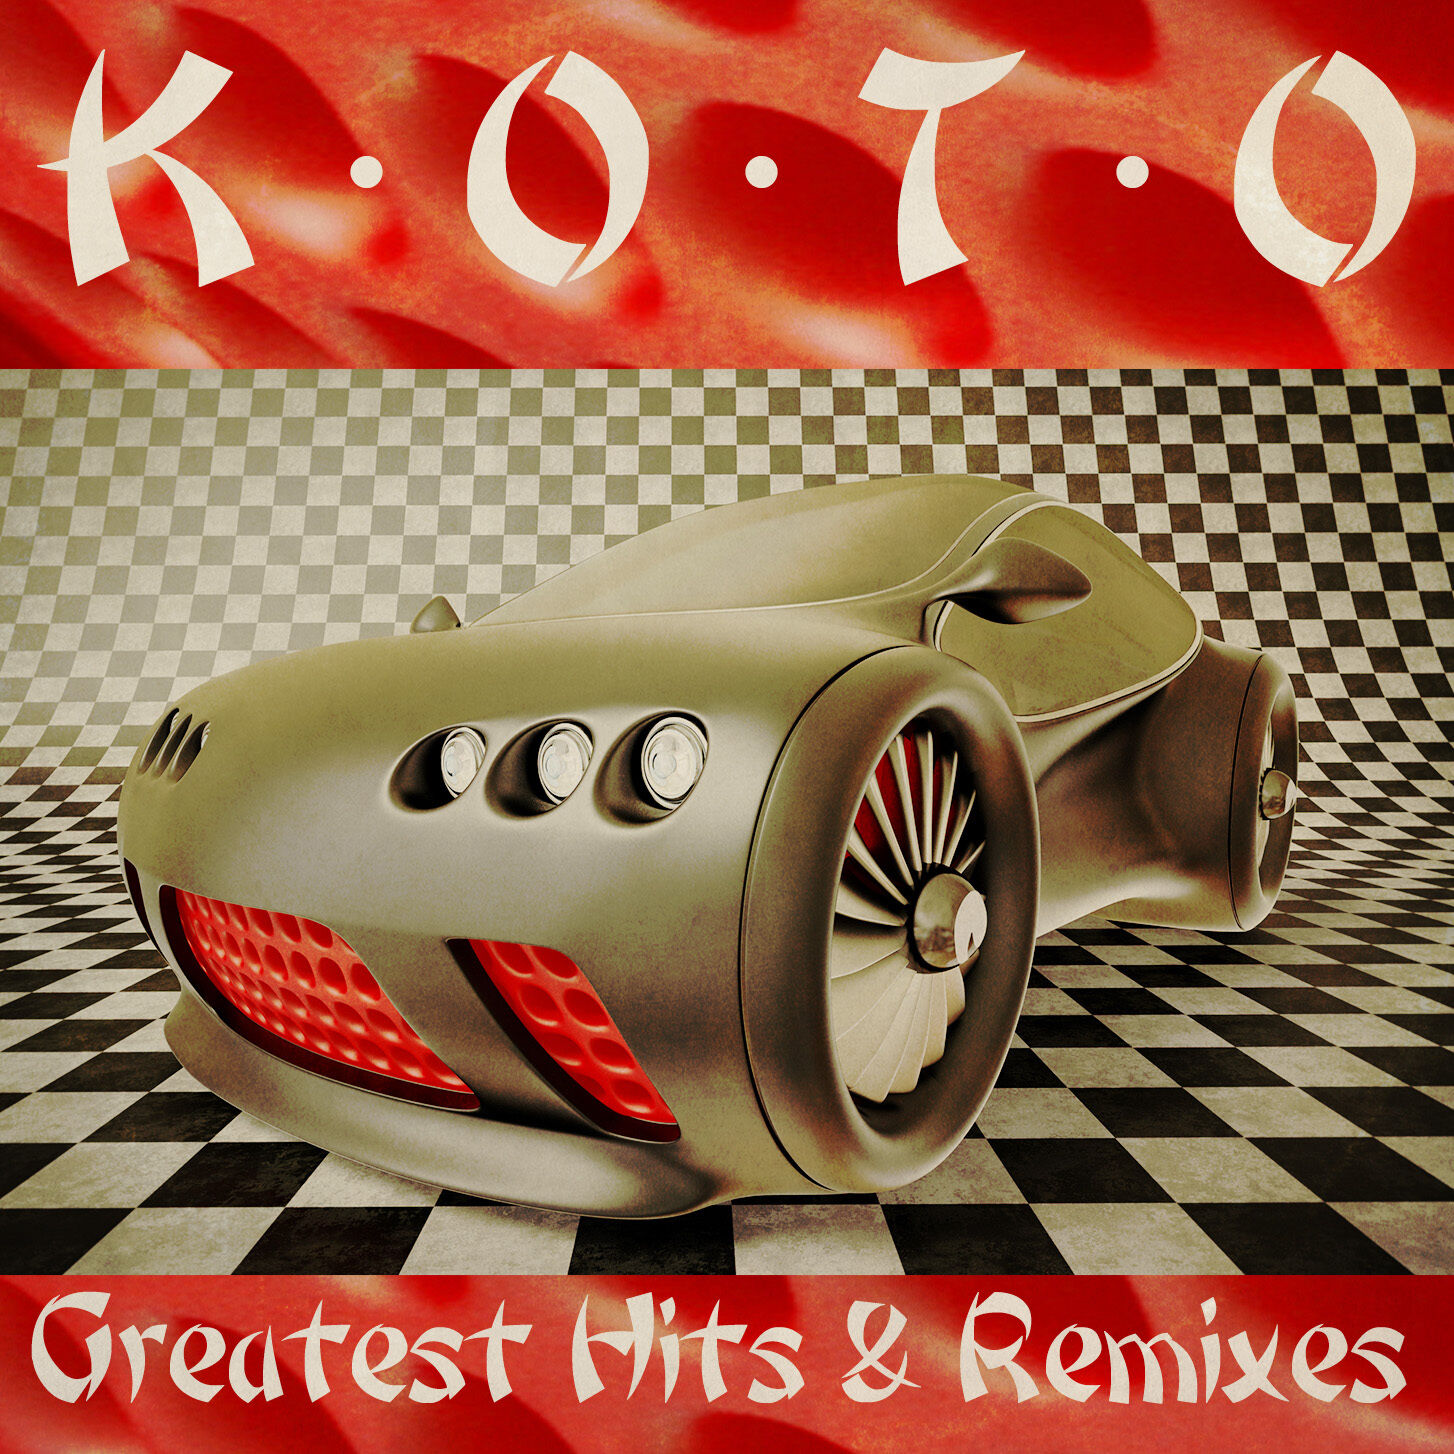 Italo CD Koto Greatest Hits and Remixes von Koto  2CDs